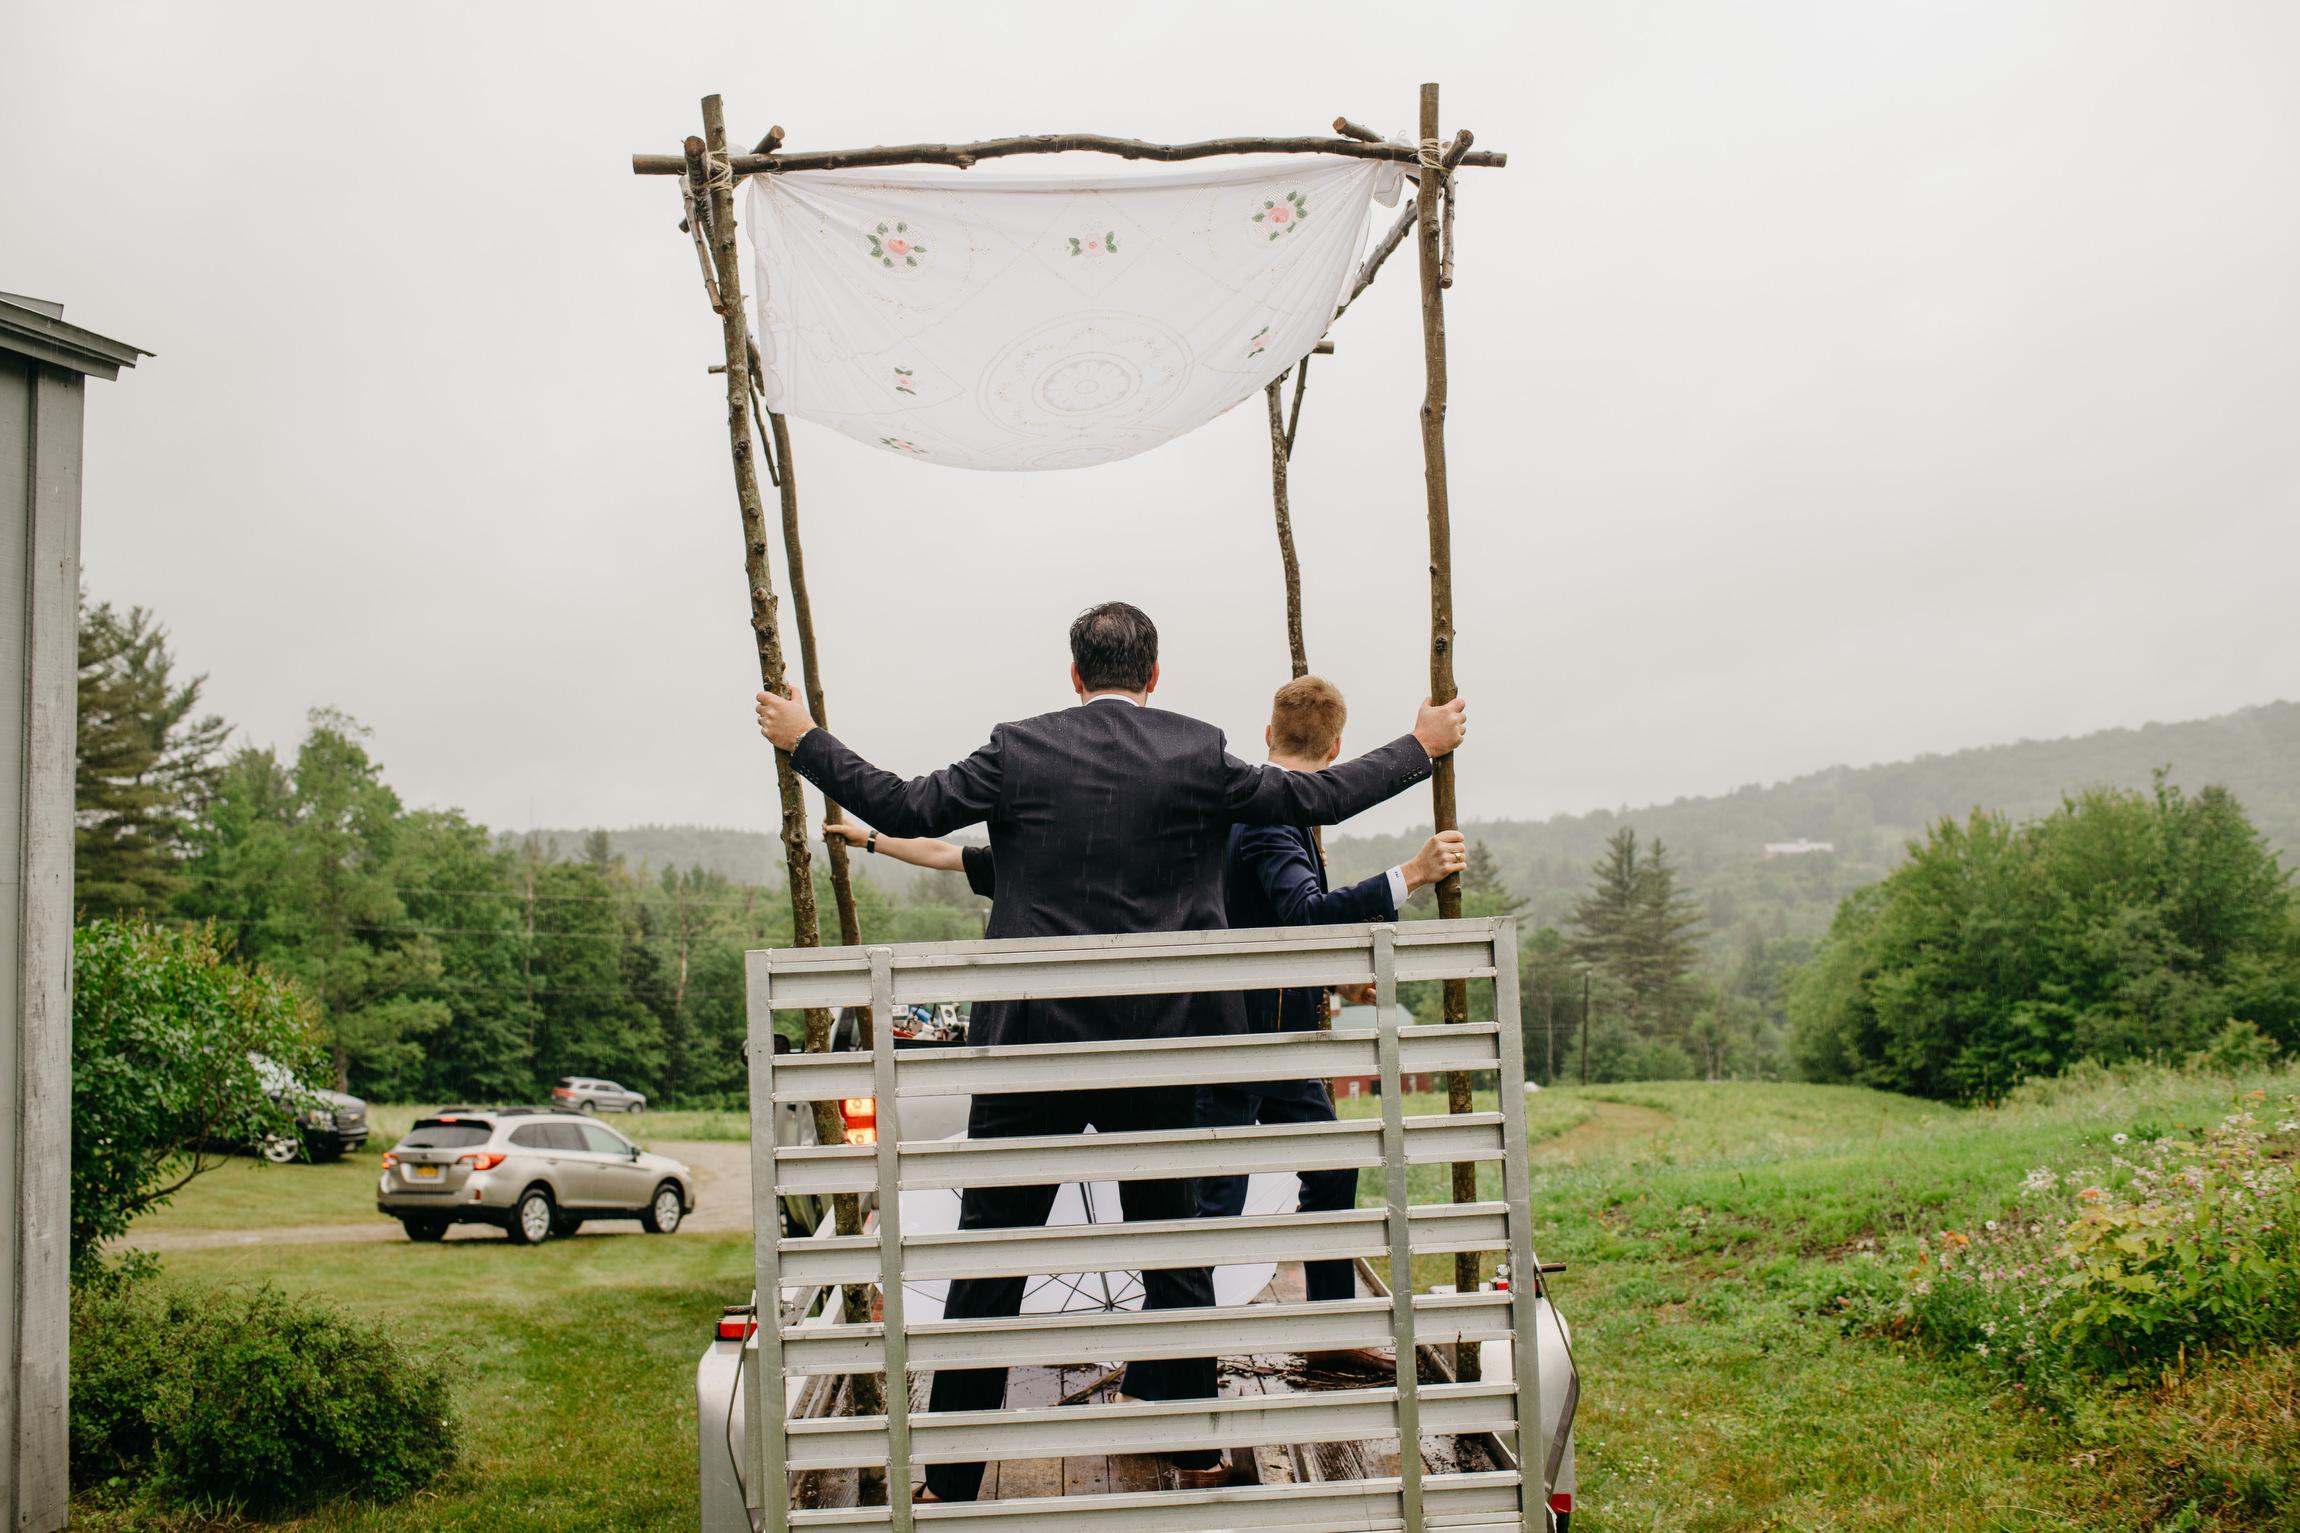 vermont_farm_wedding_photos_mikhail_glabetS_18.JPG